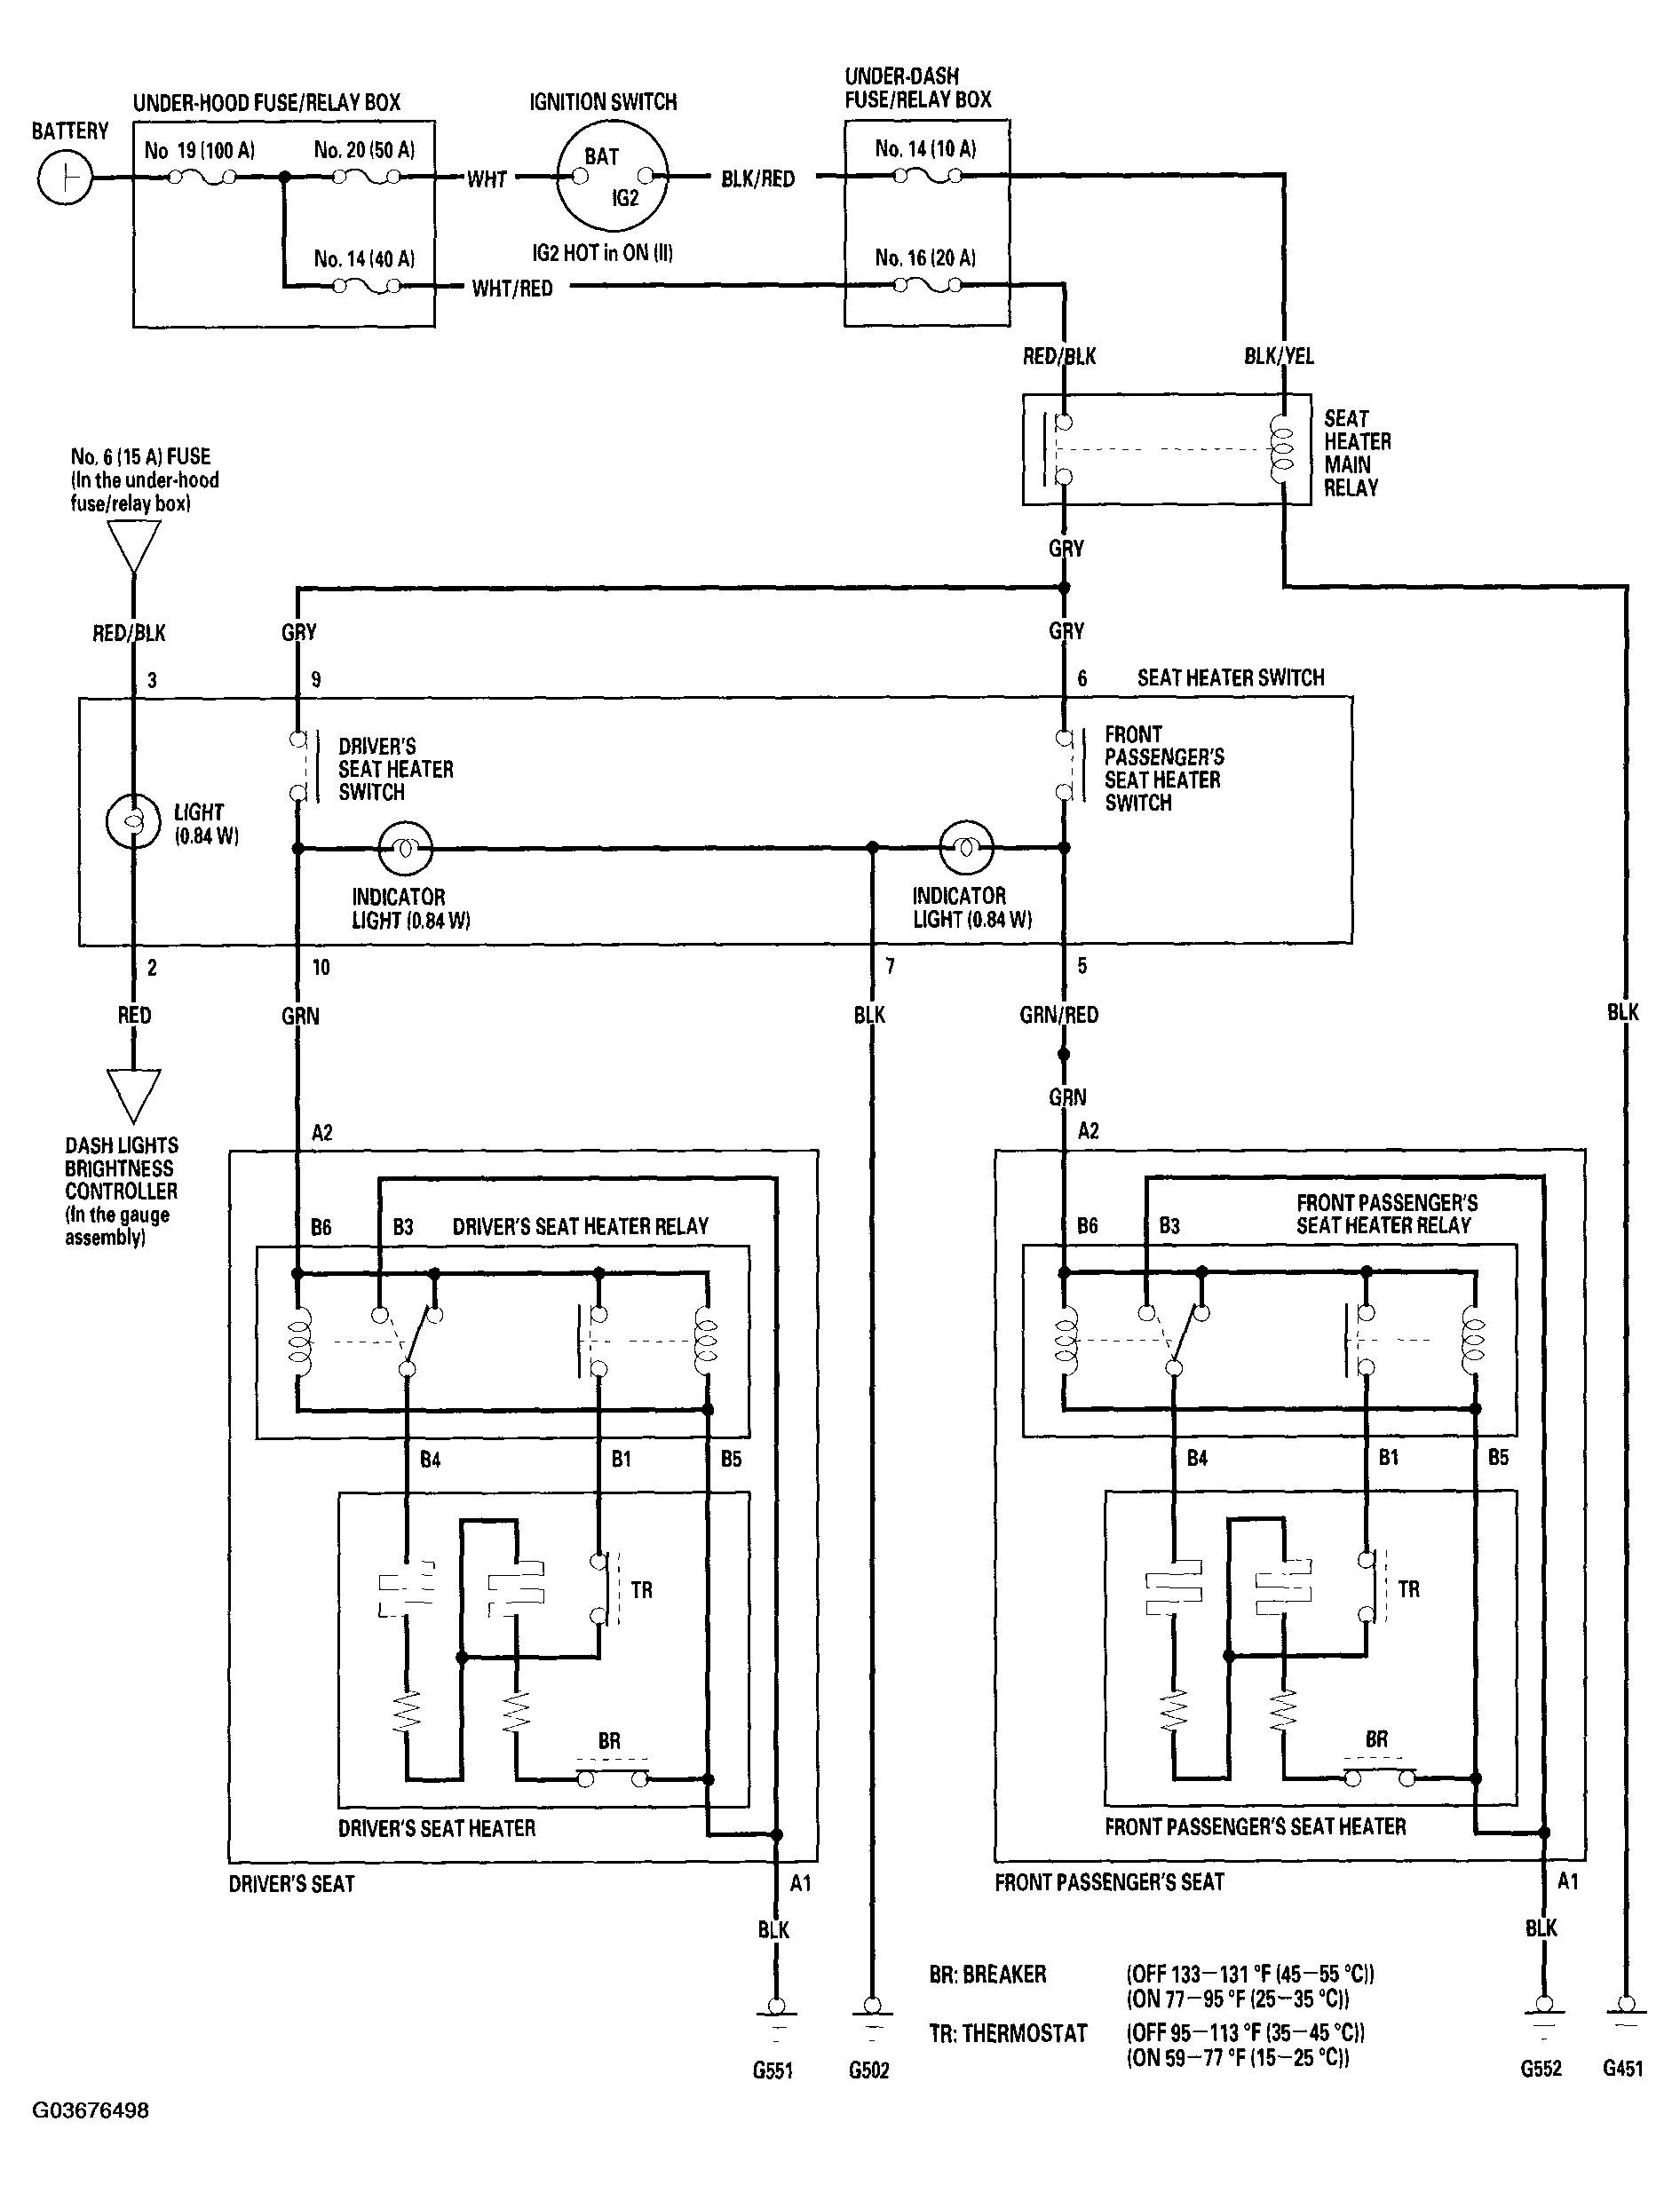 ... 2000 civic engine diagram 1994 honda accord engine diagram cr v fuse  2000 honda civic interior